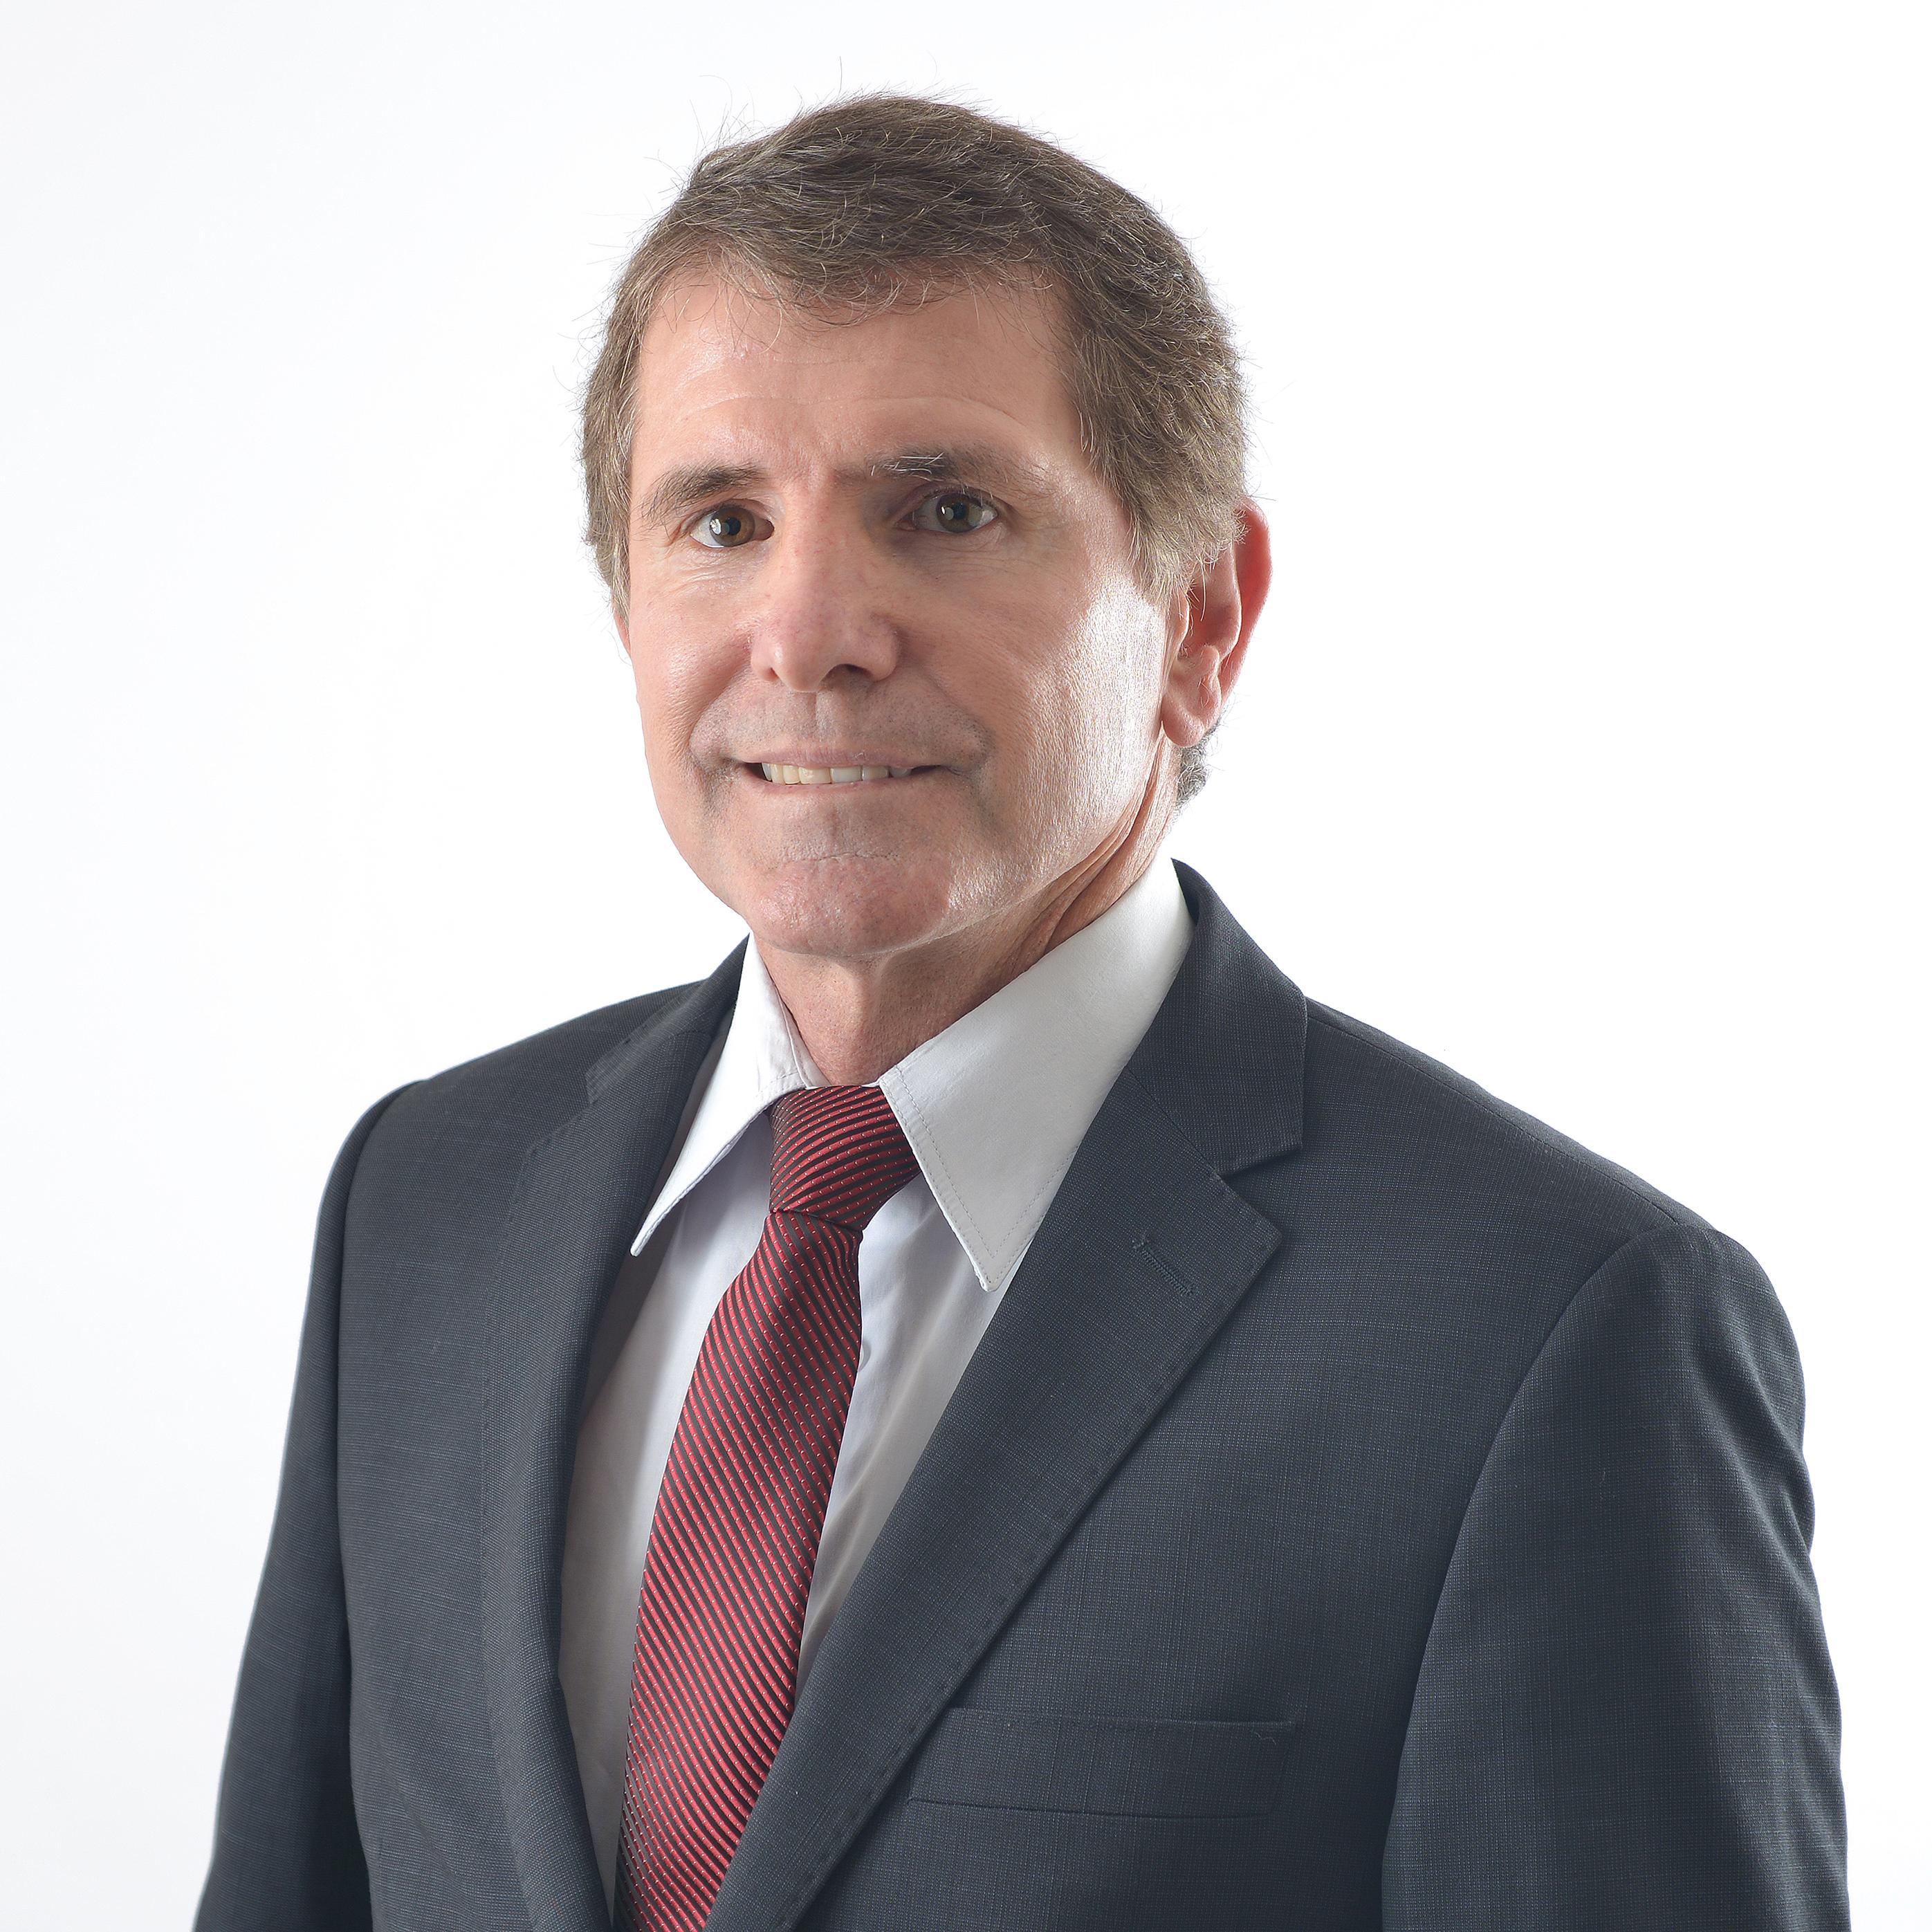 Judson Castro Perez